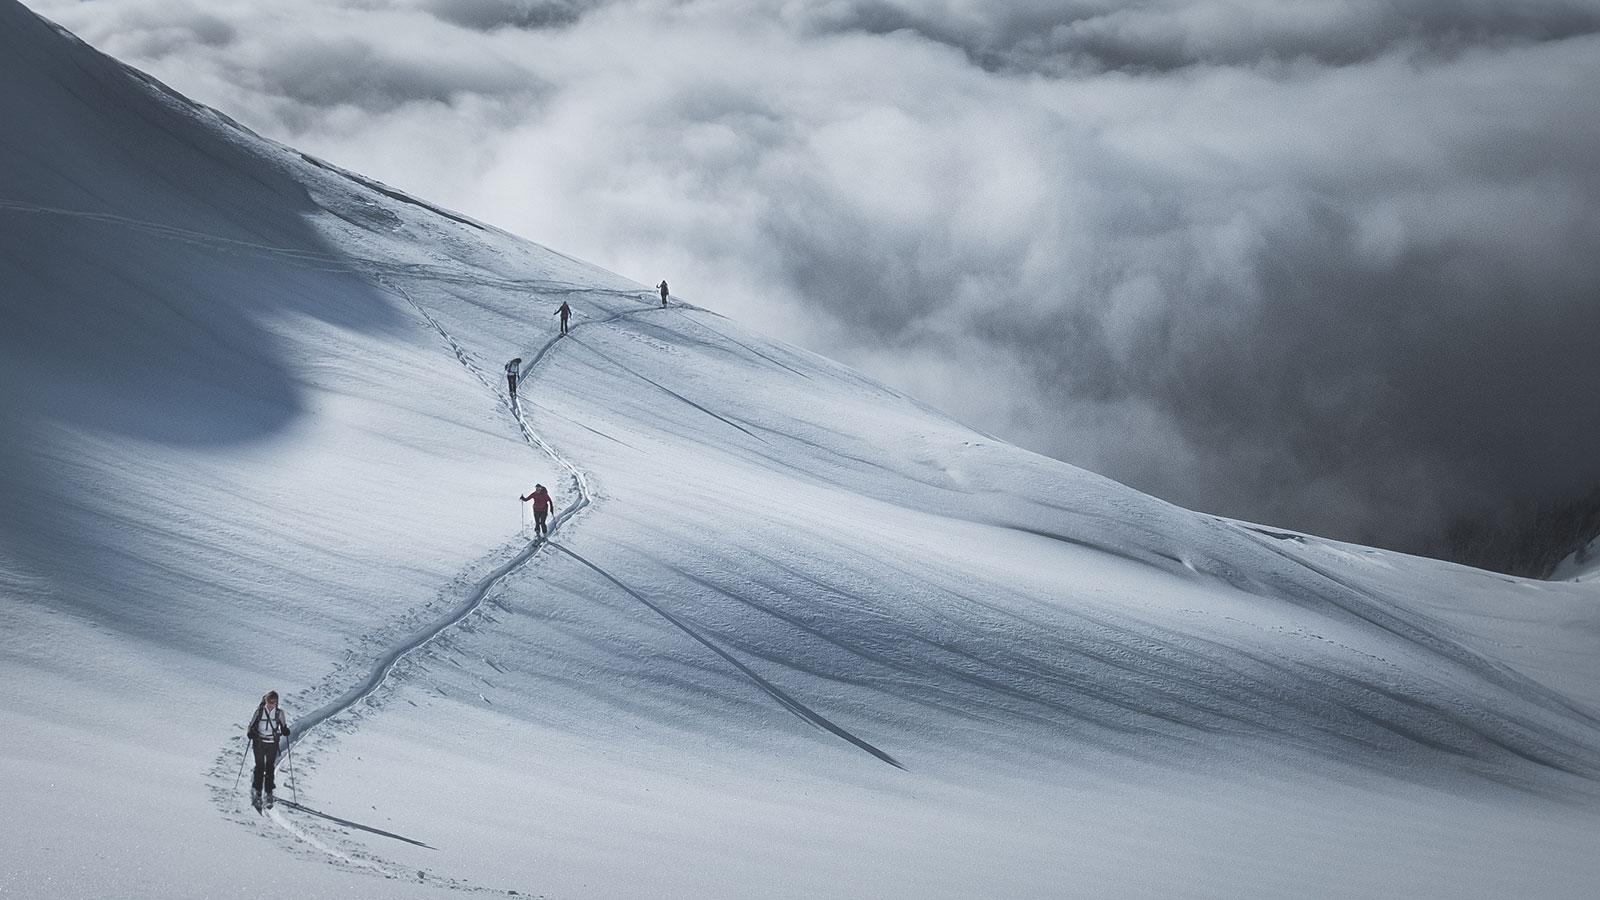 Abstand. Skitour in Südtirol | Pauli Trenkwalder, Berge & Psychologie